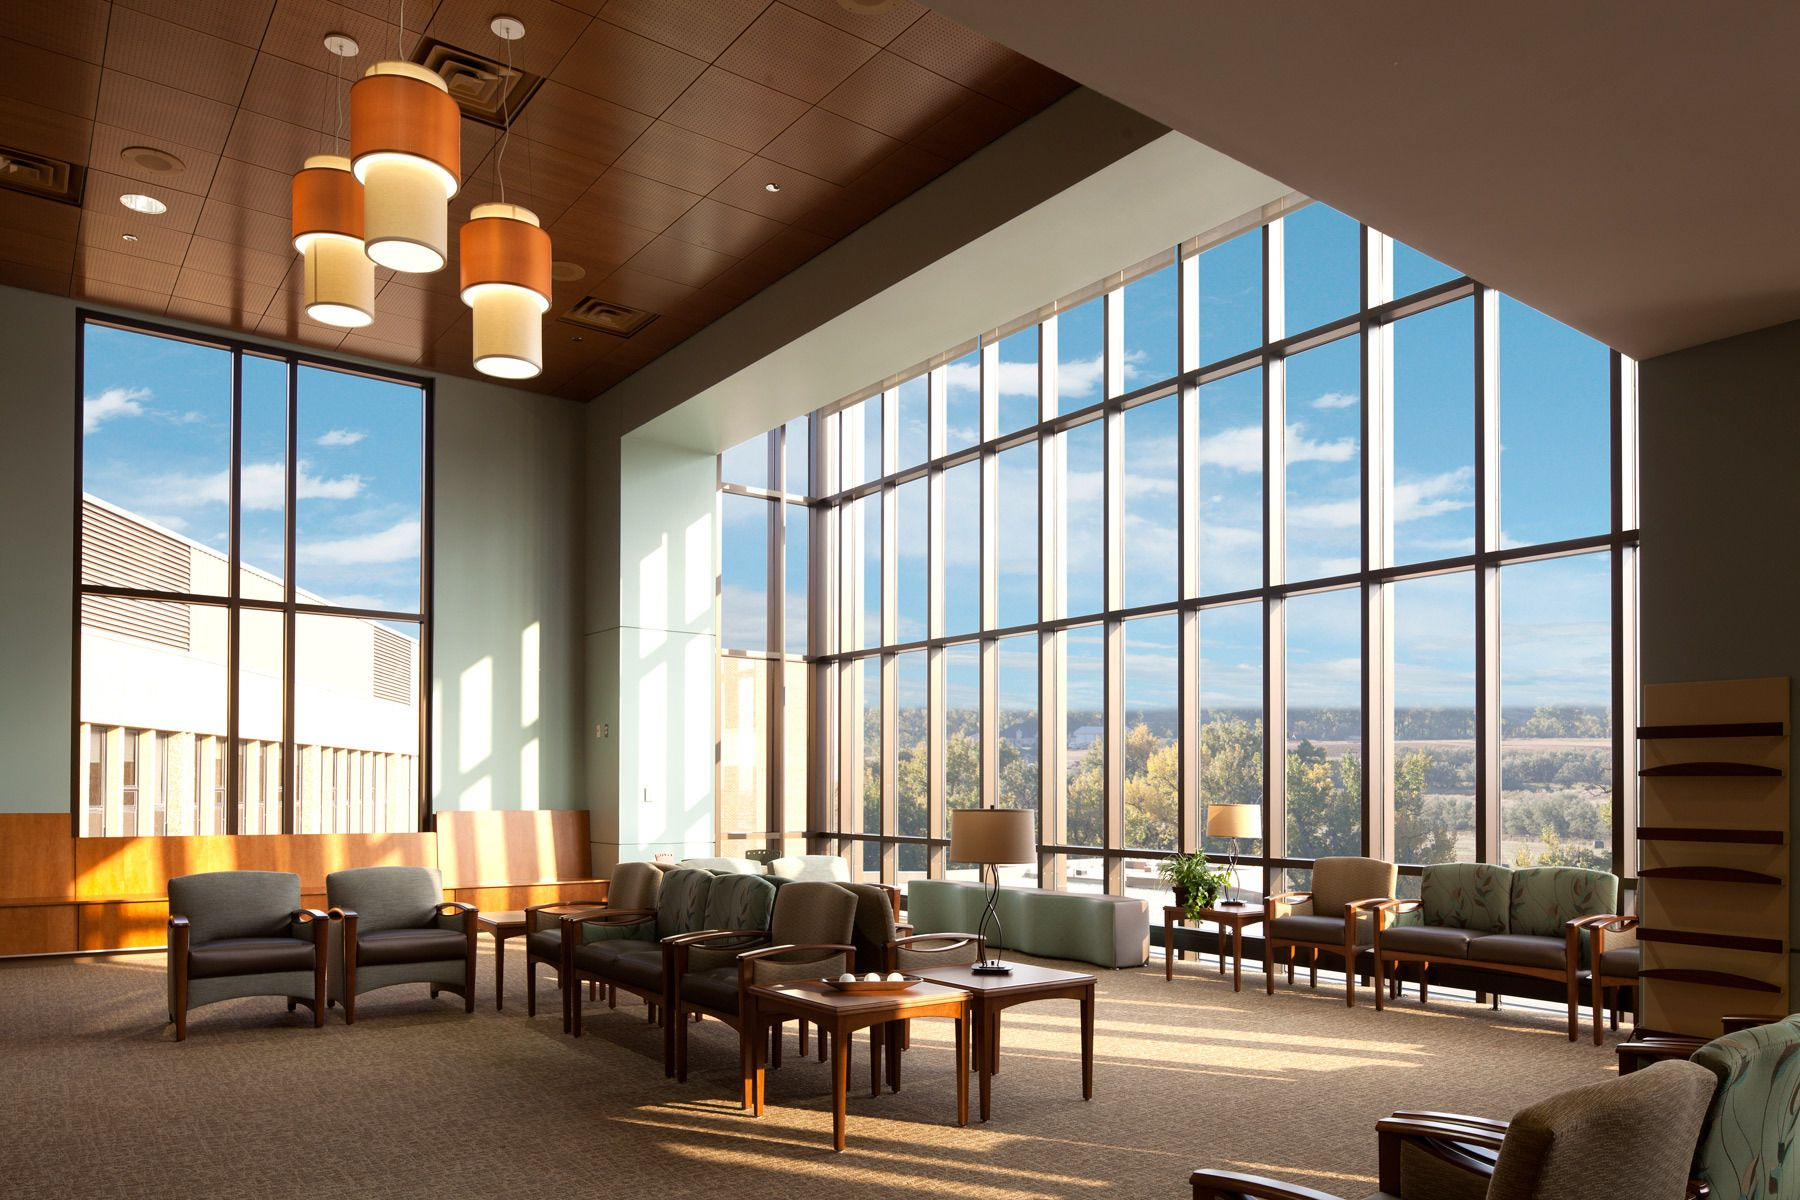 1hospital_douglas_county_lobby.jpg